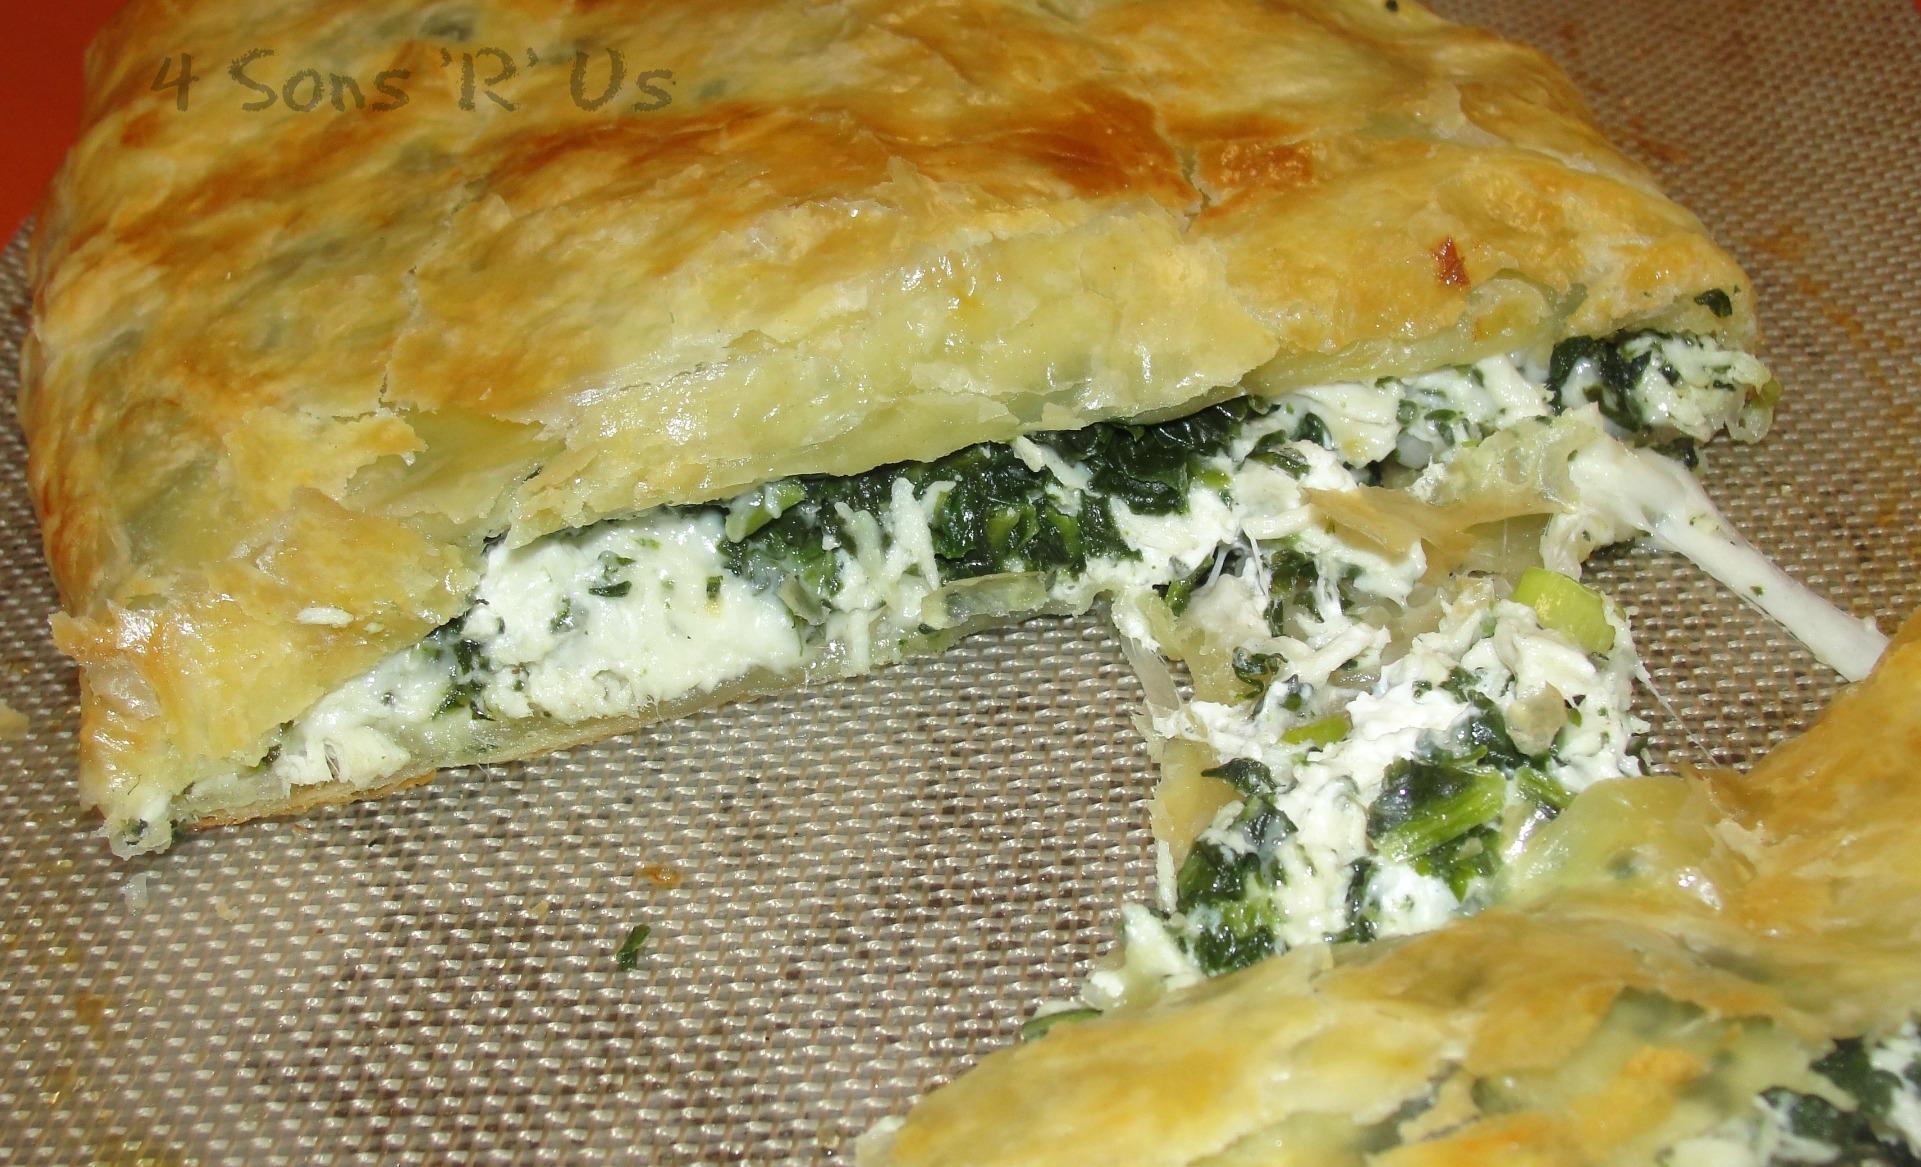 Greek Spinach Feta Chicken Pockets | 4 Sons 'R' Us